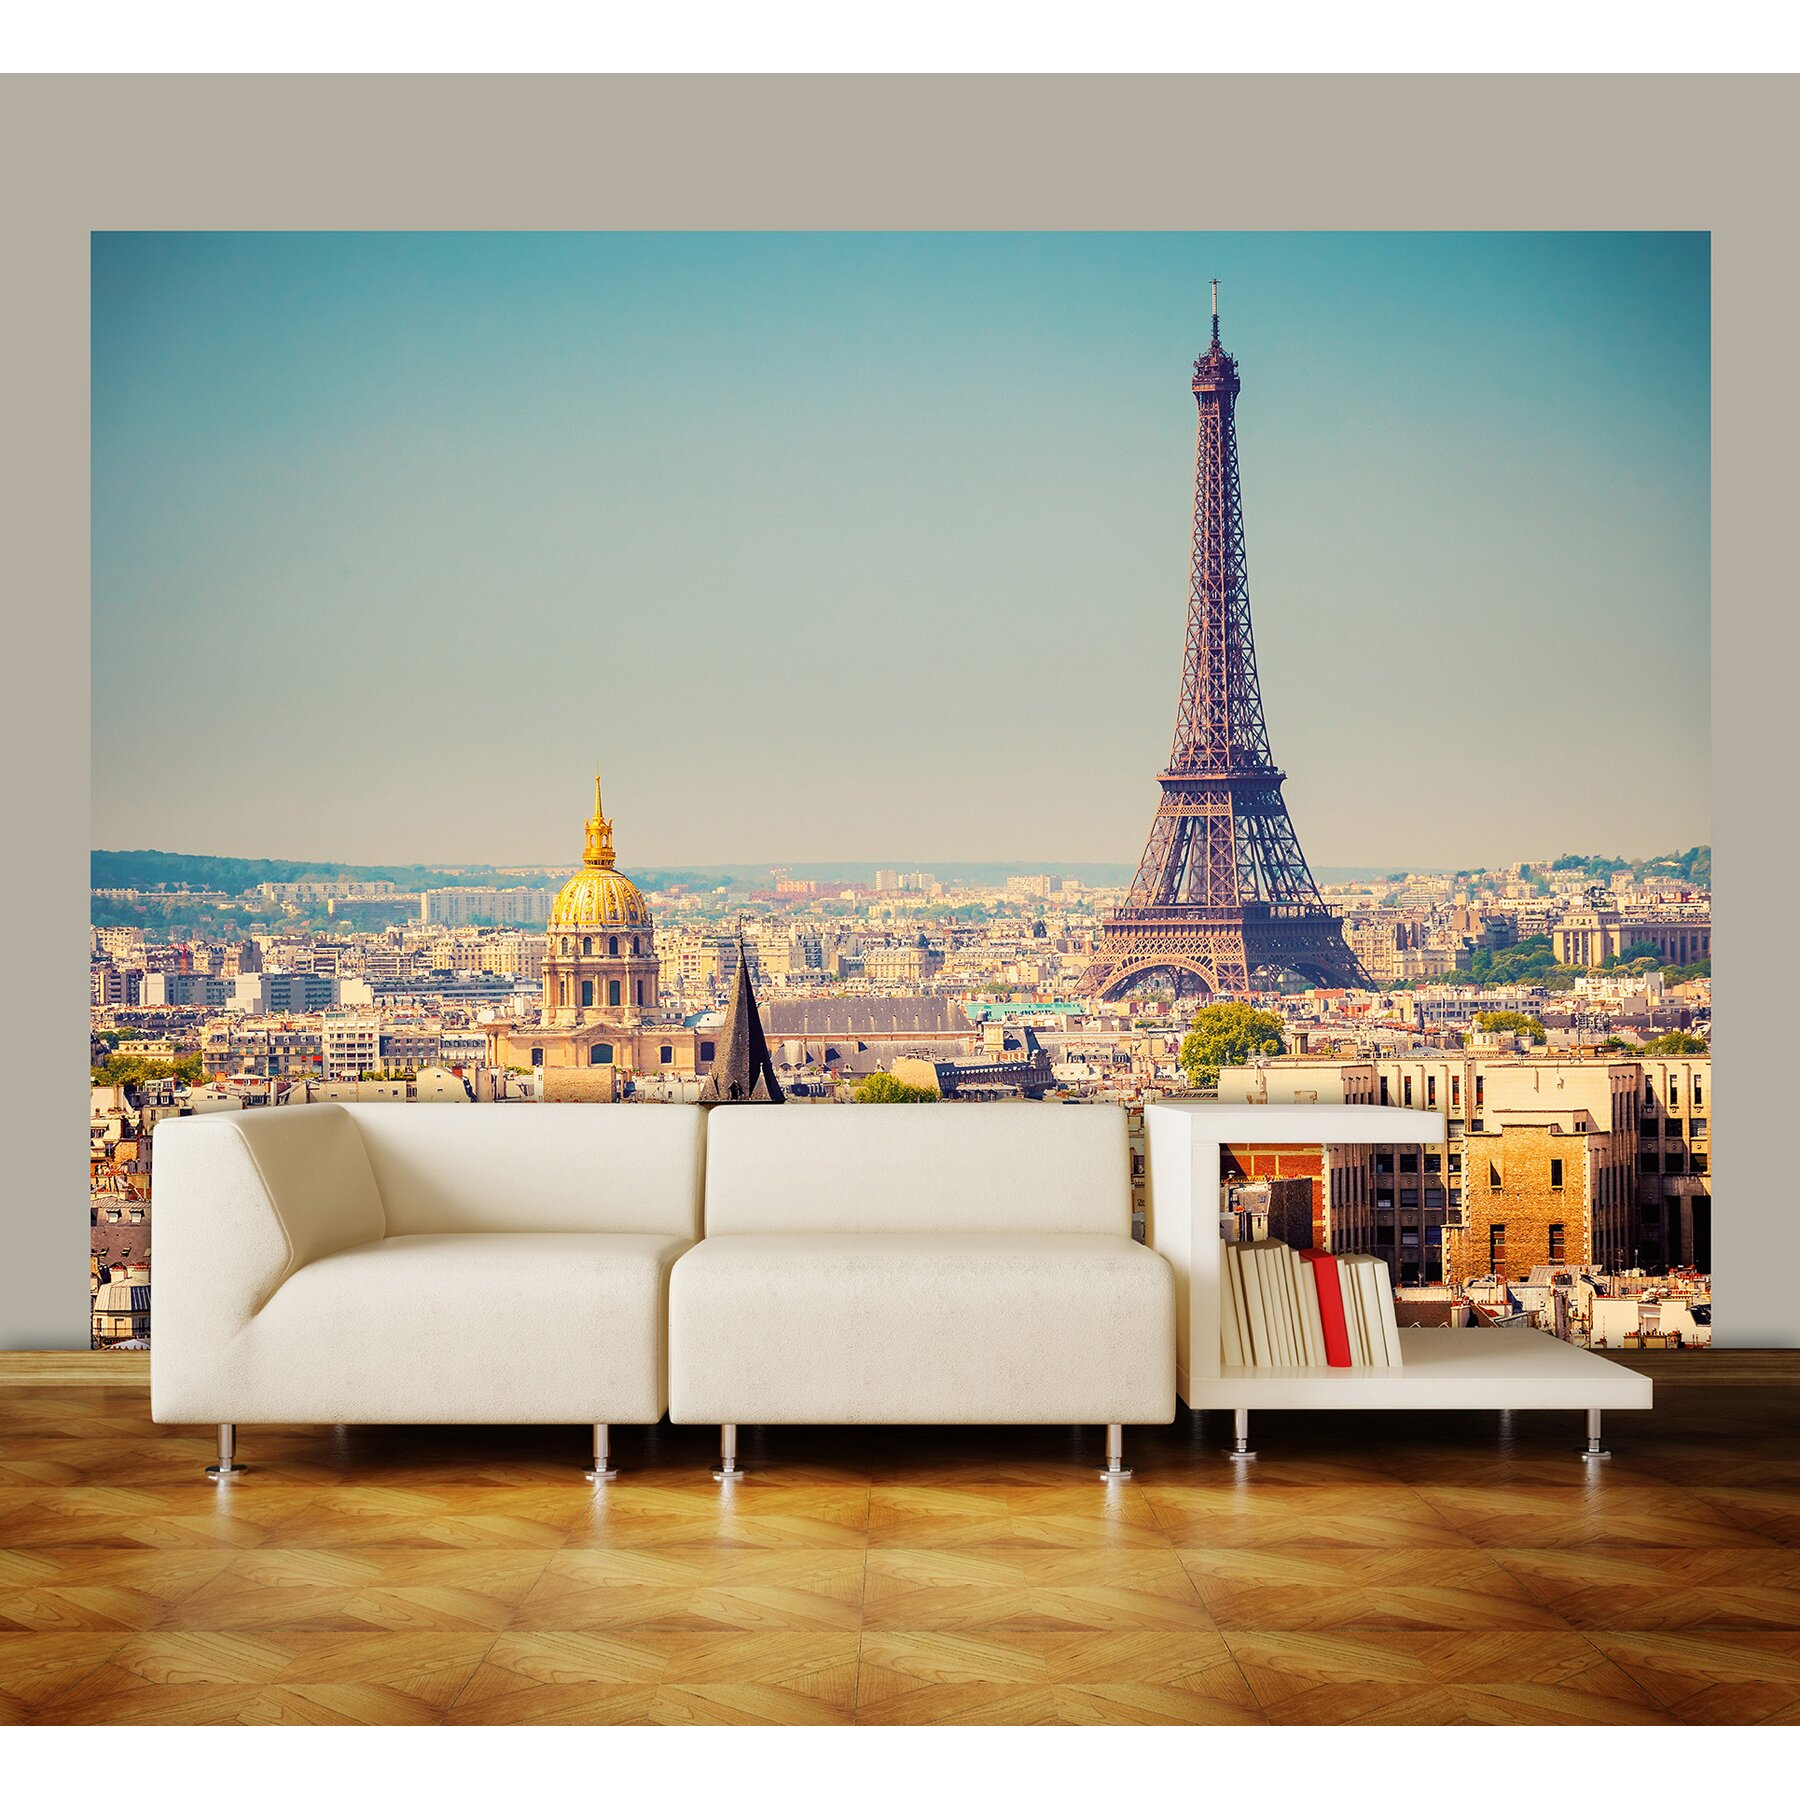 ideal decor paris wall mural wayfair eboy s paris themed pixel art wall mural milton amp king